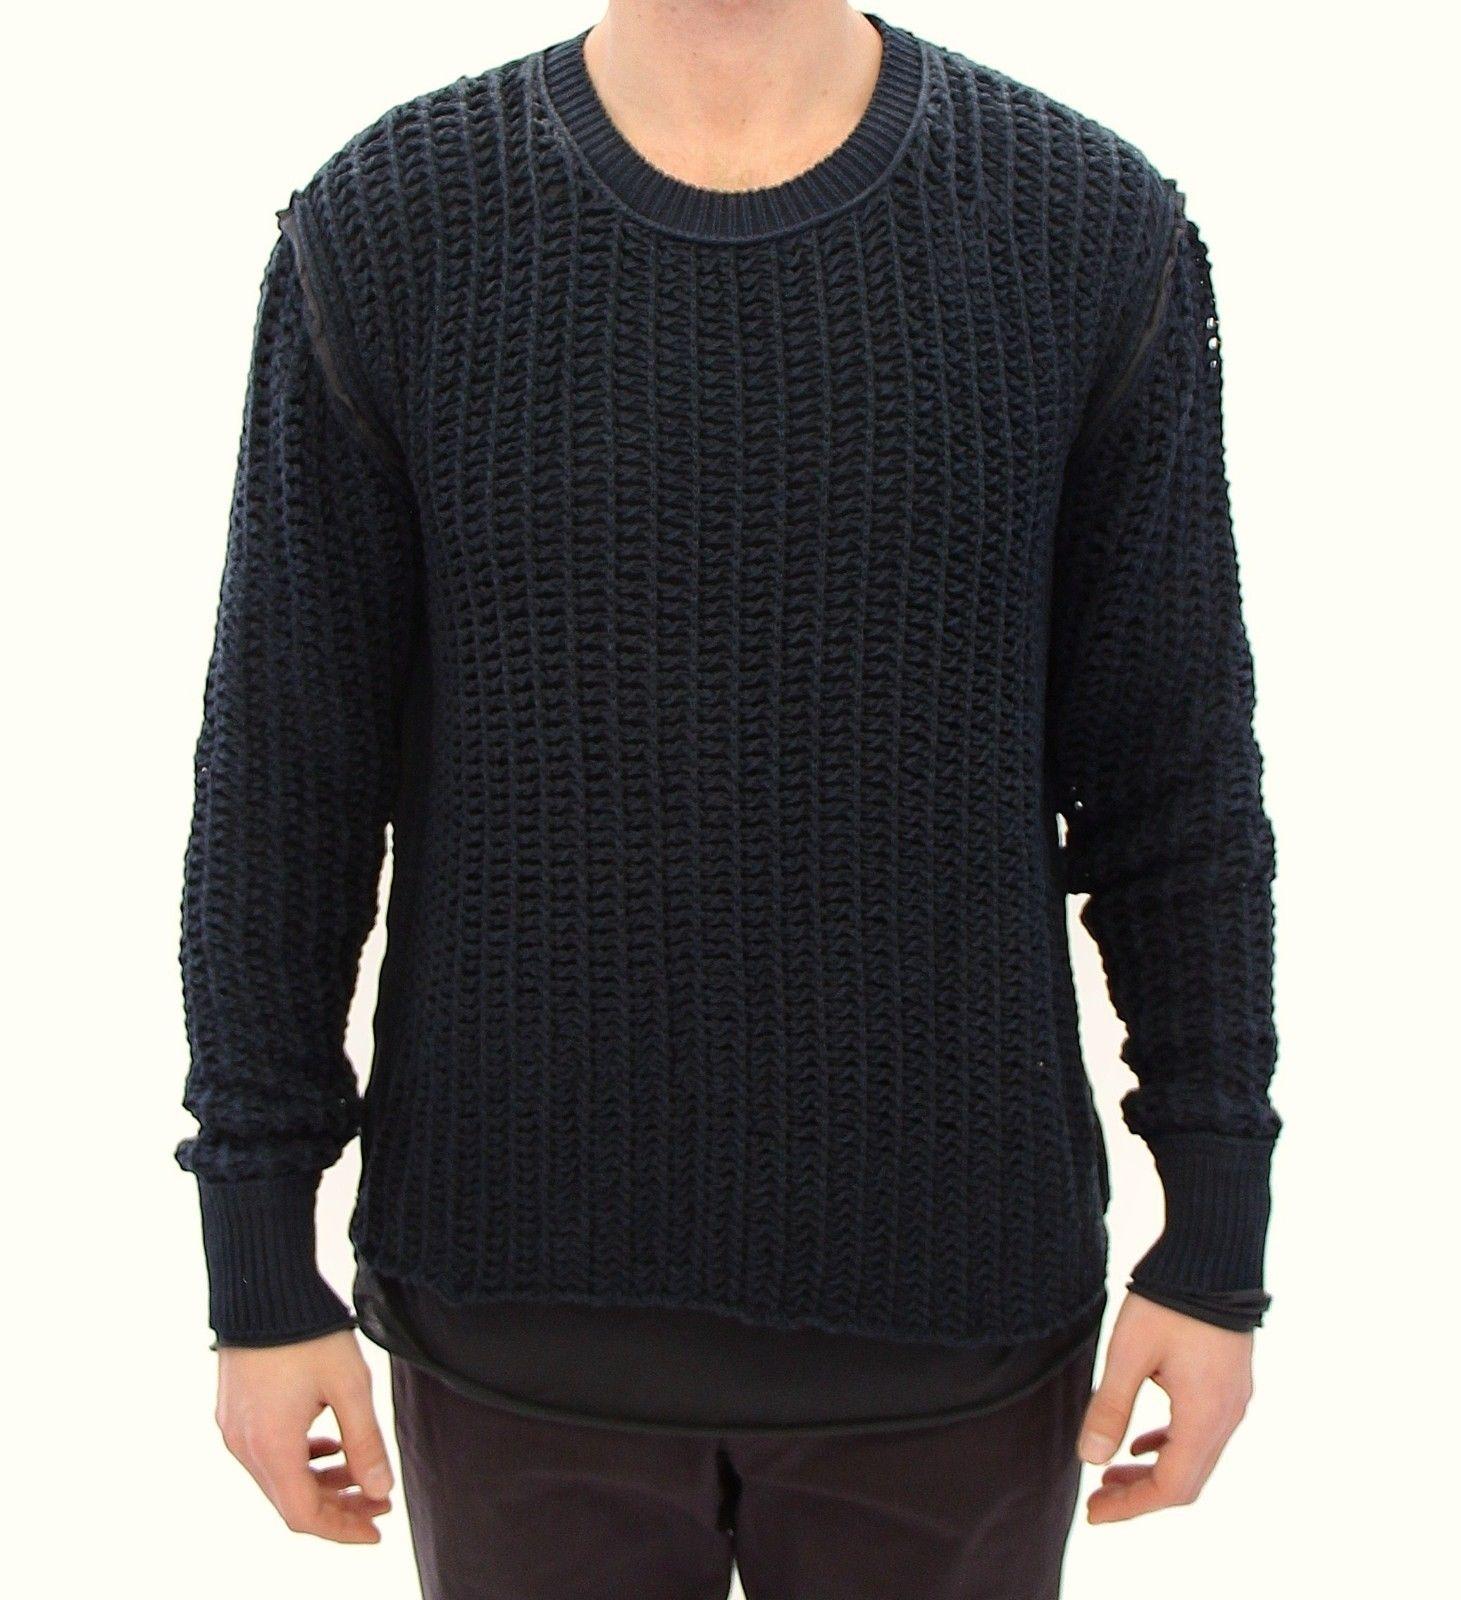 Dolce & Gabbana Men's Runway Netz Pullover Netted Sweater Blue GTH10687 - IT48 | M